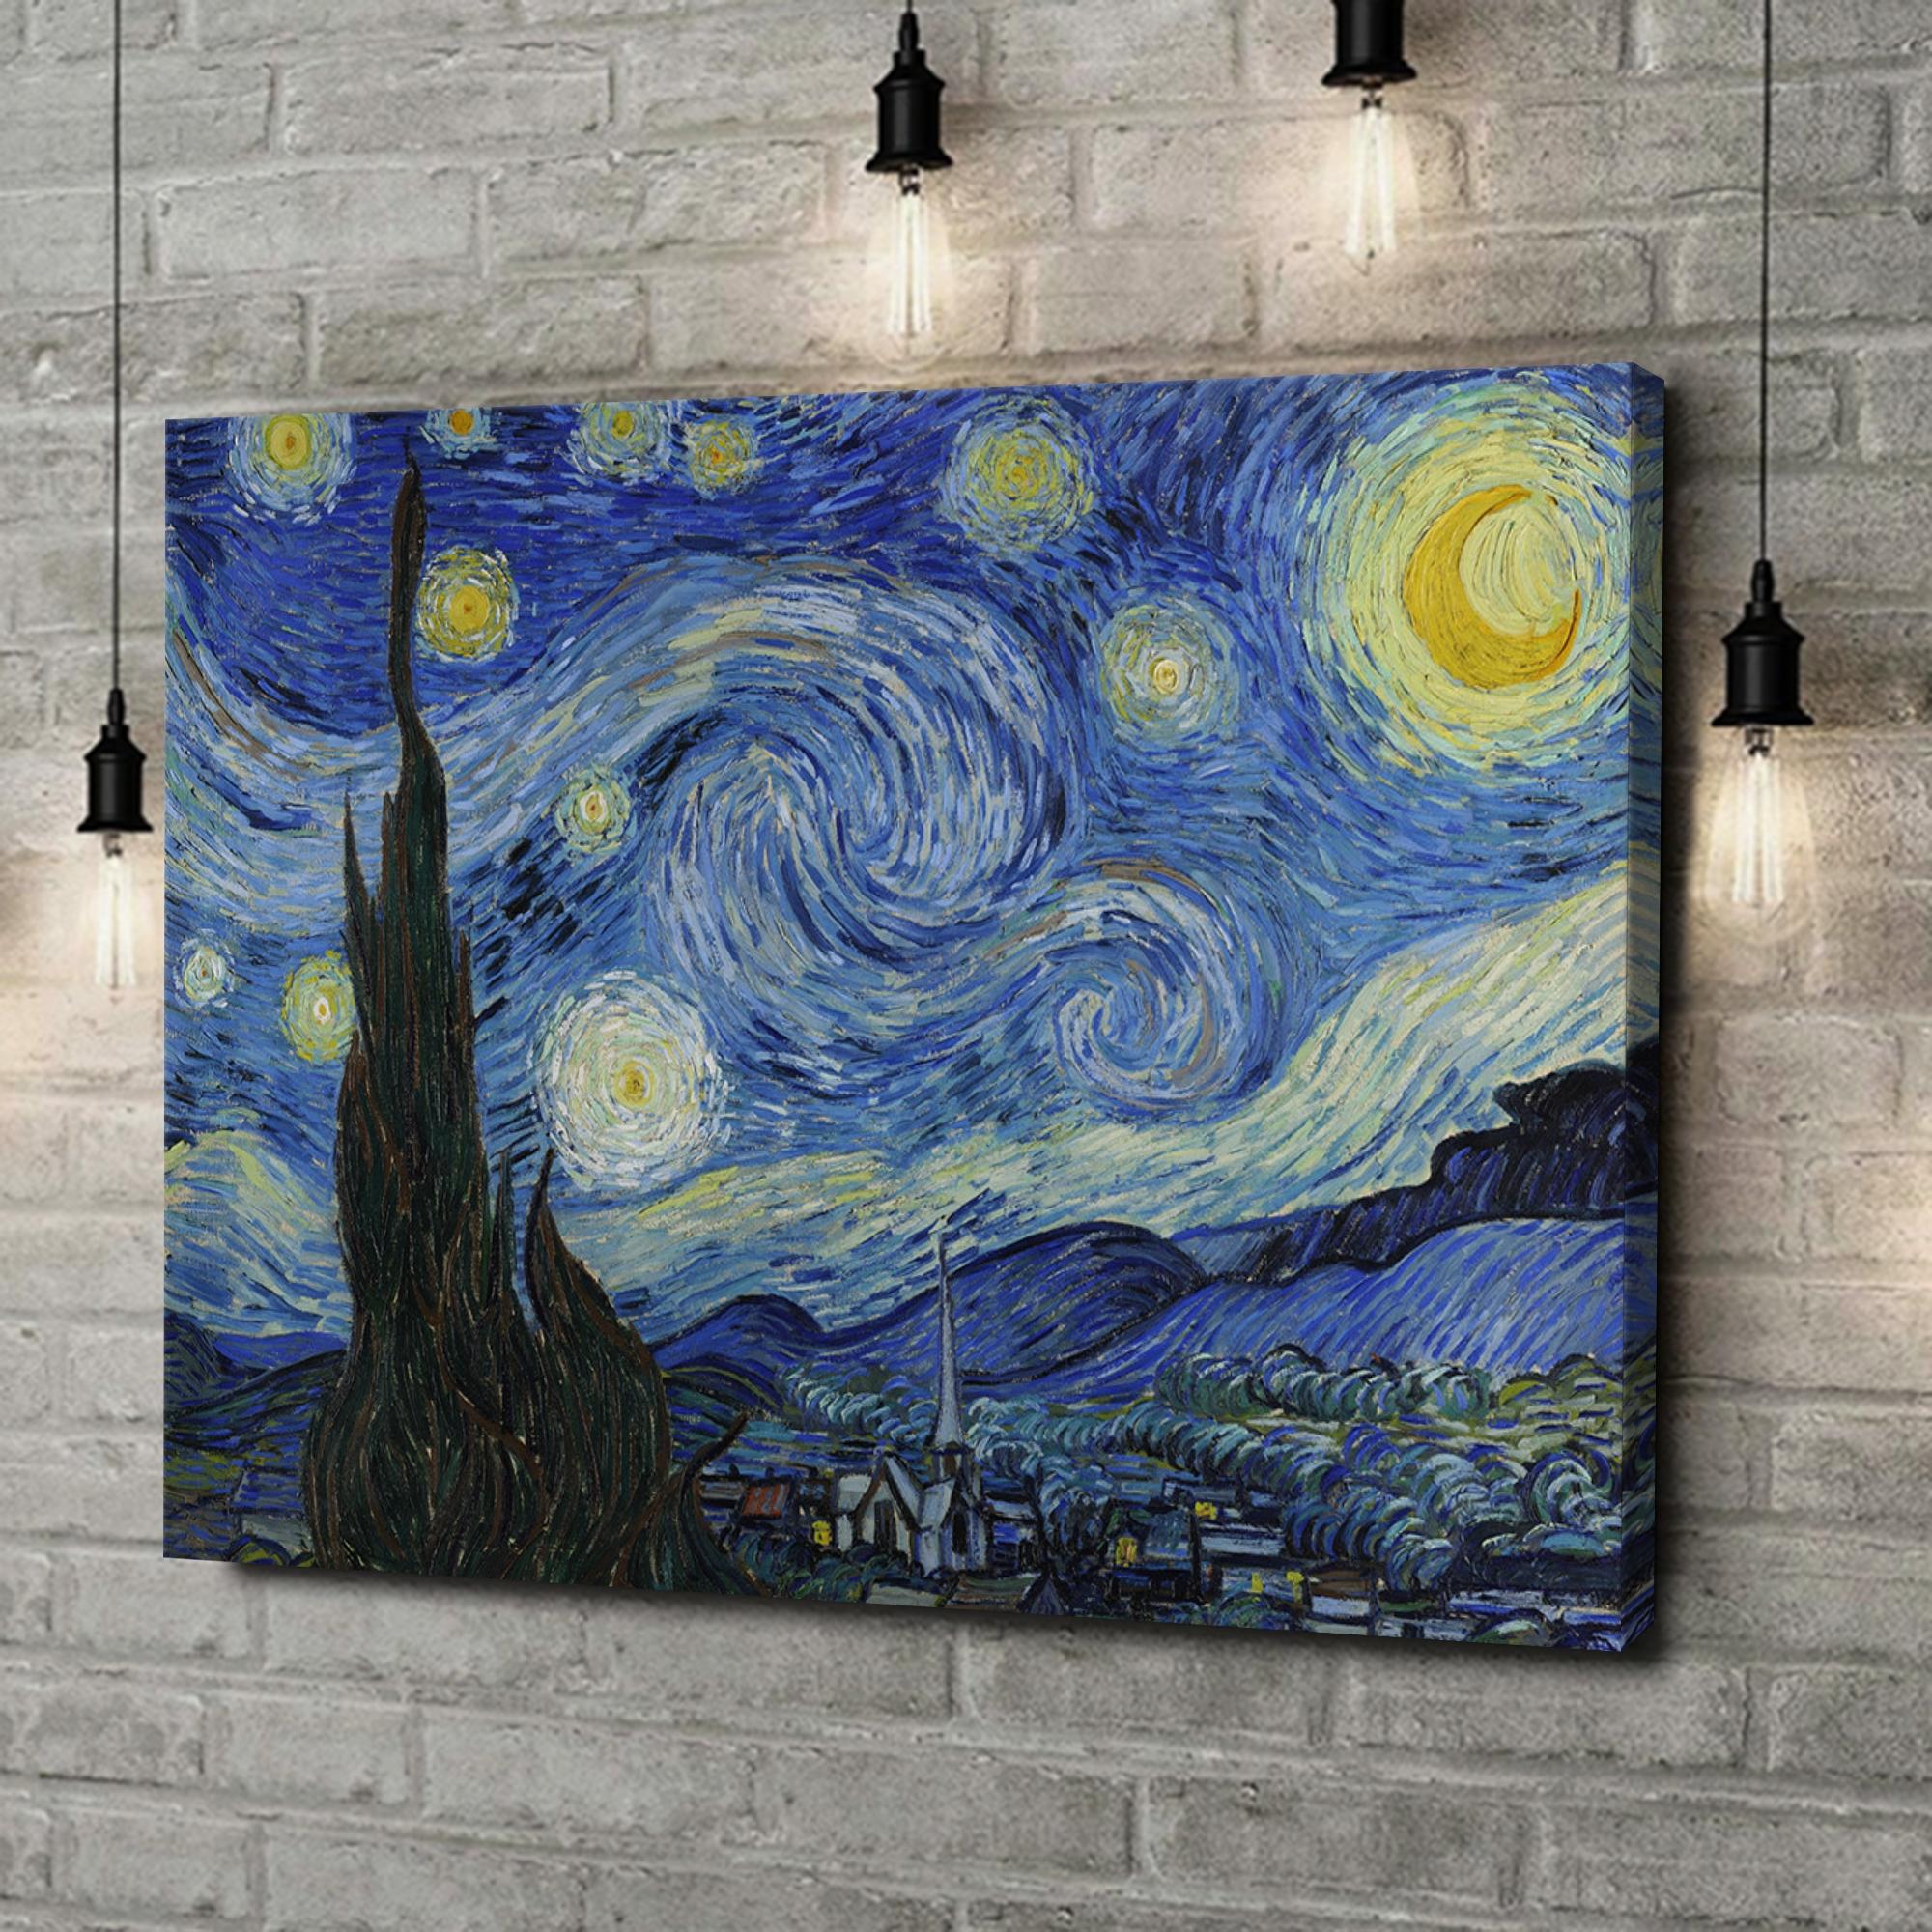 Leinwandbild personalisiert Sternennacht